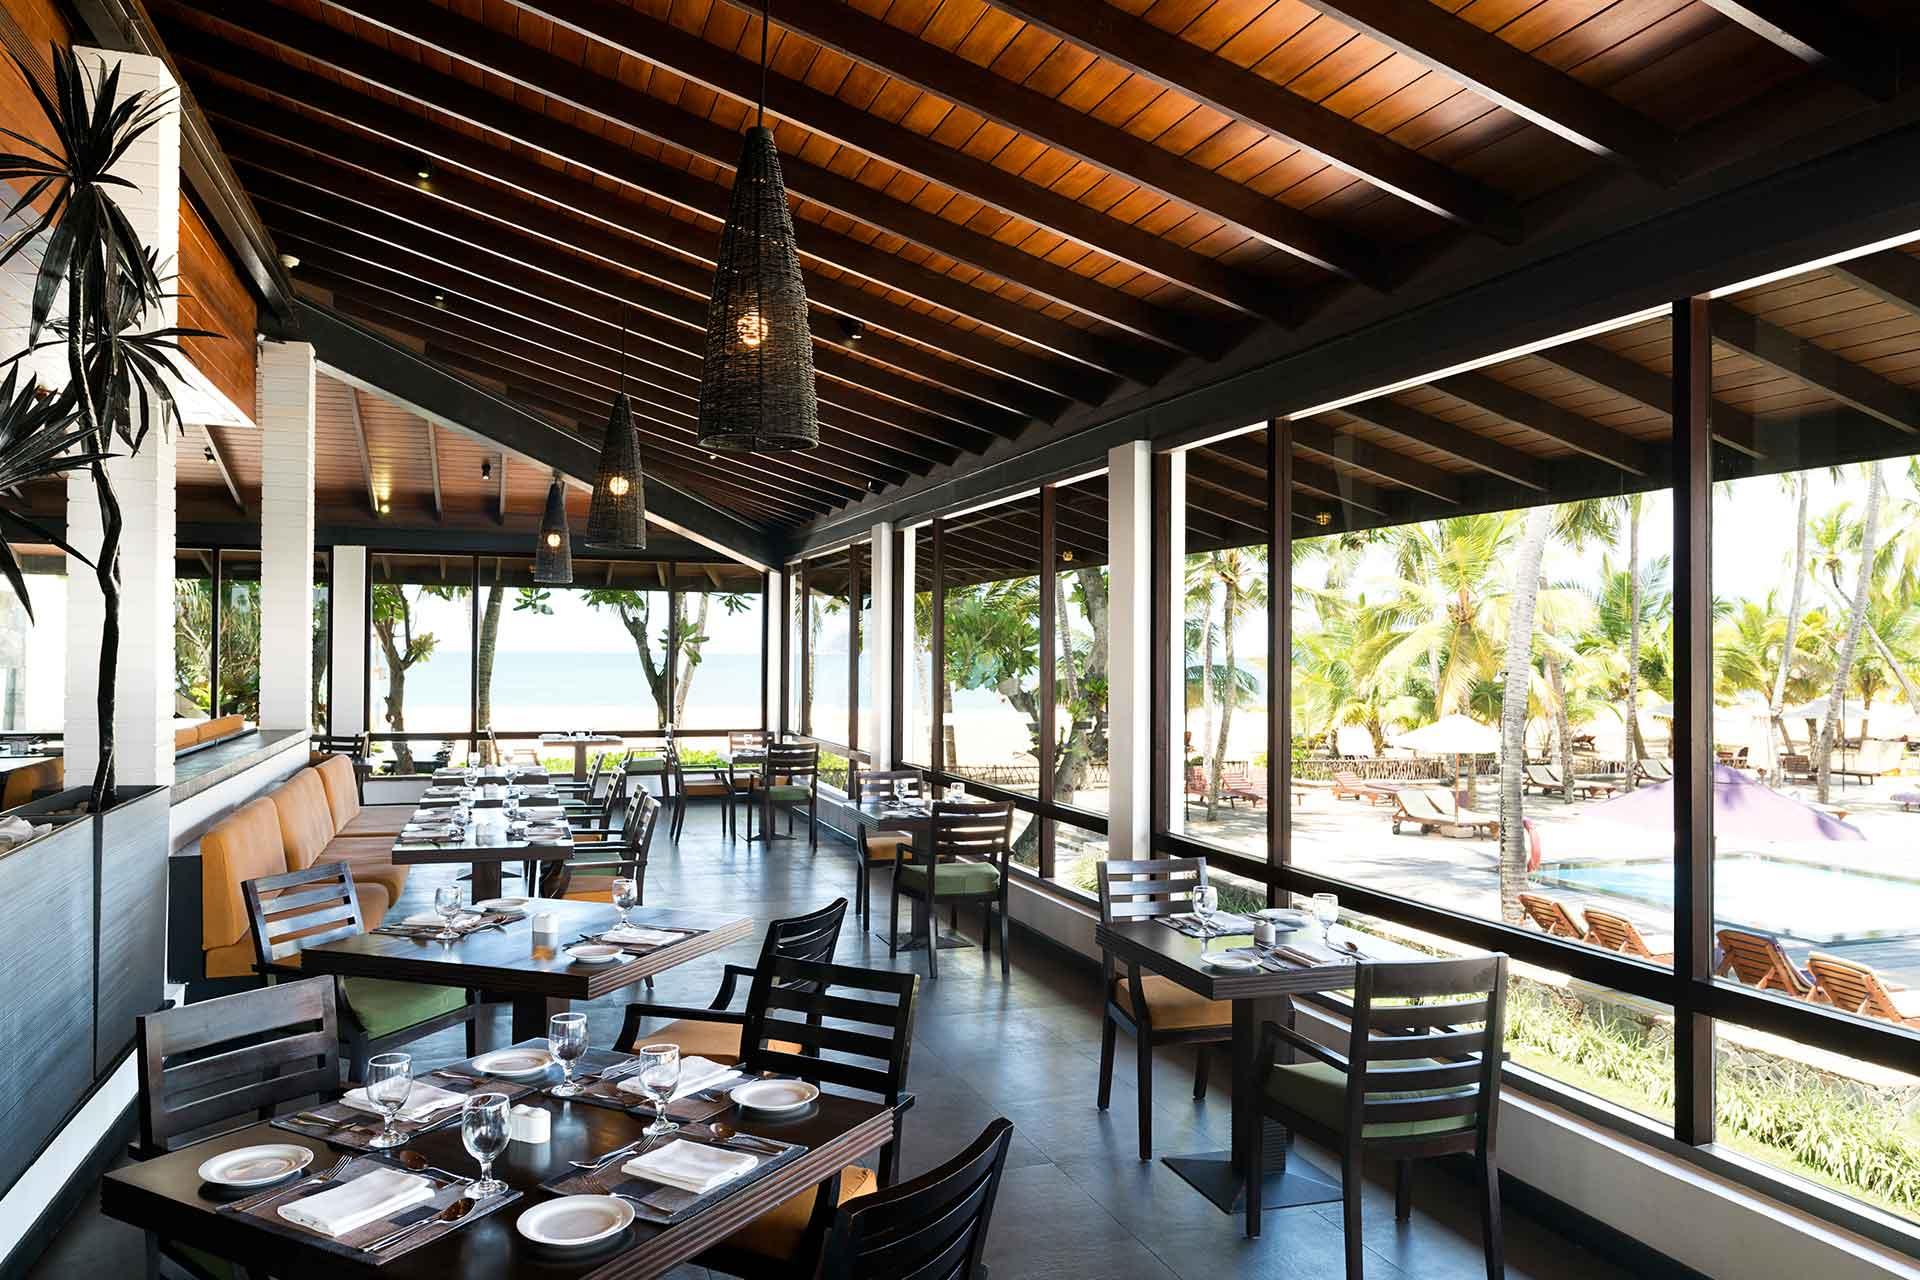 Mangrove restaurant interior